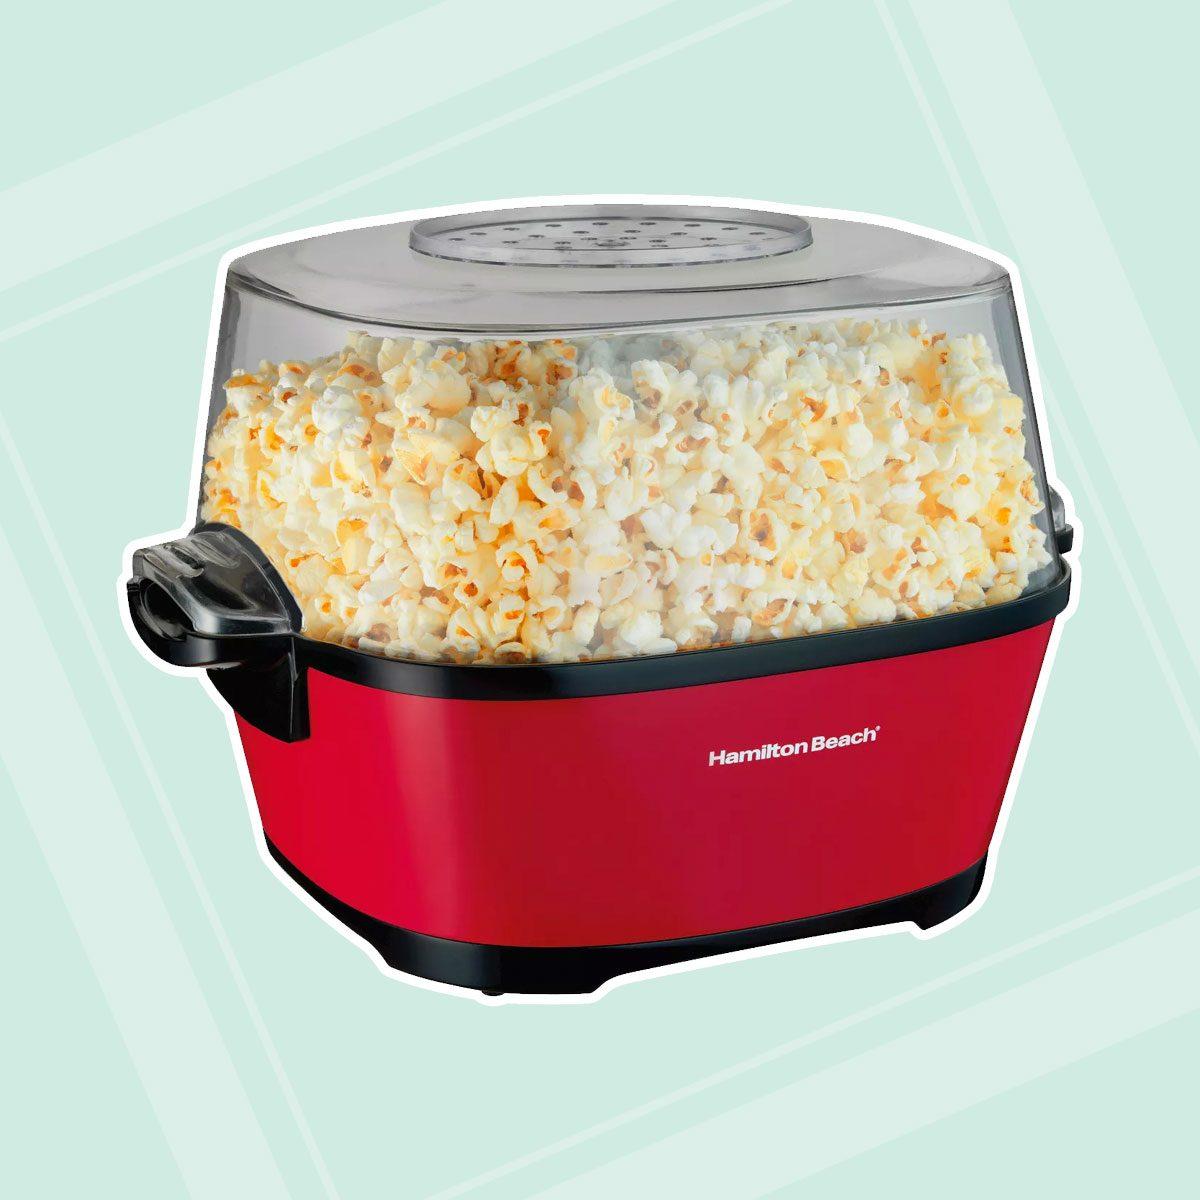 Hamilton Beach Electric Popcorn Maker